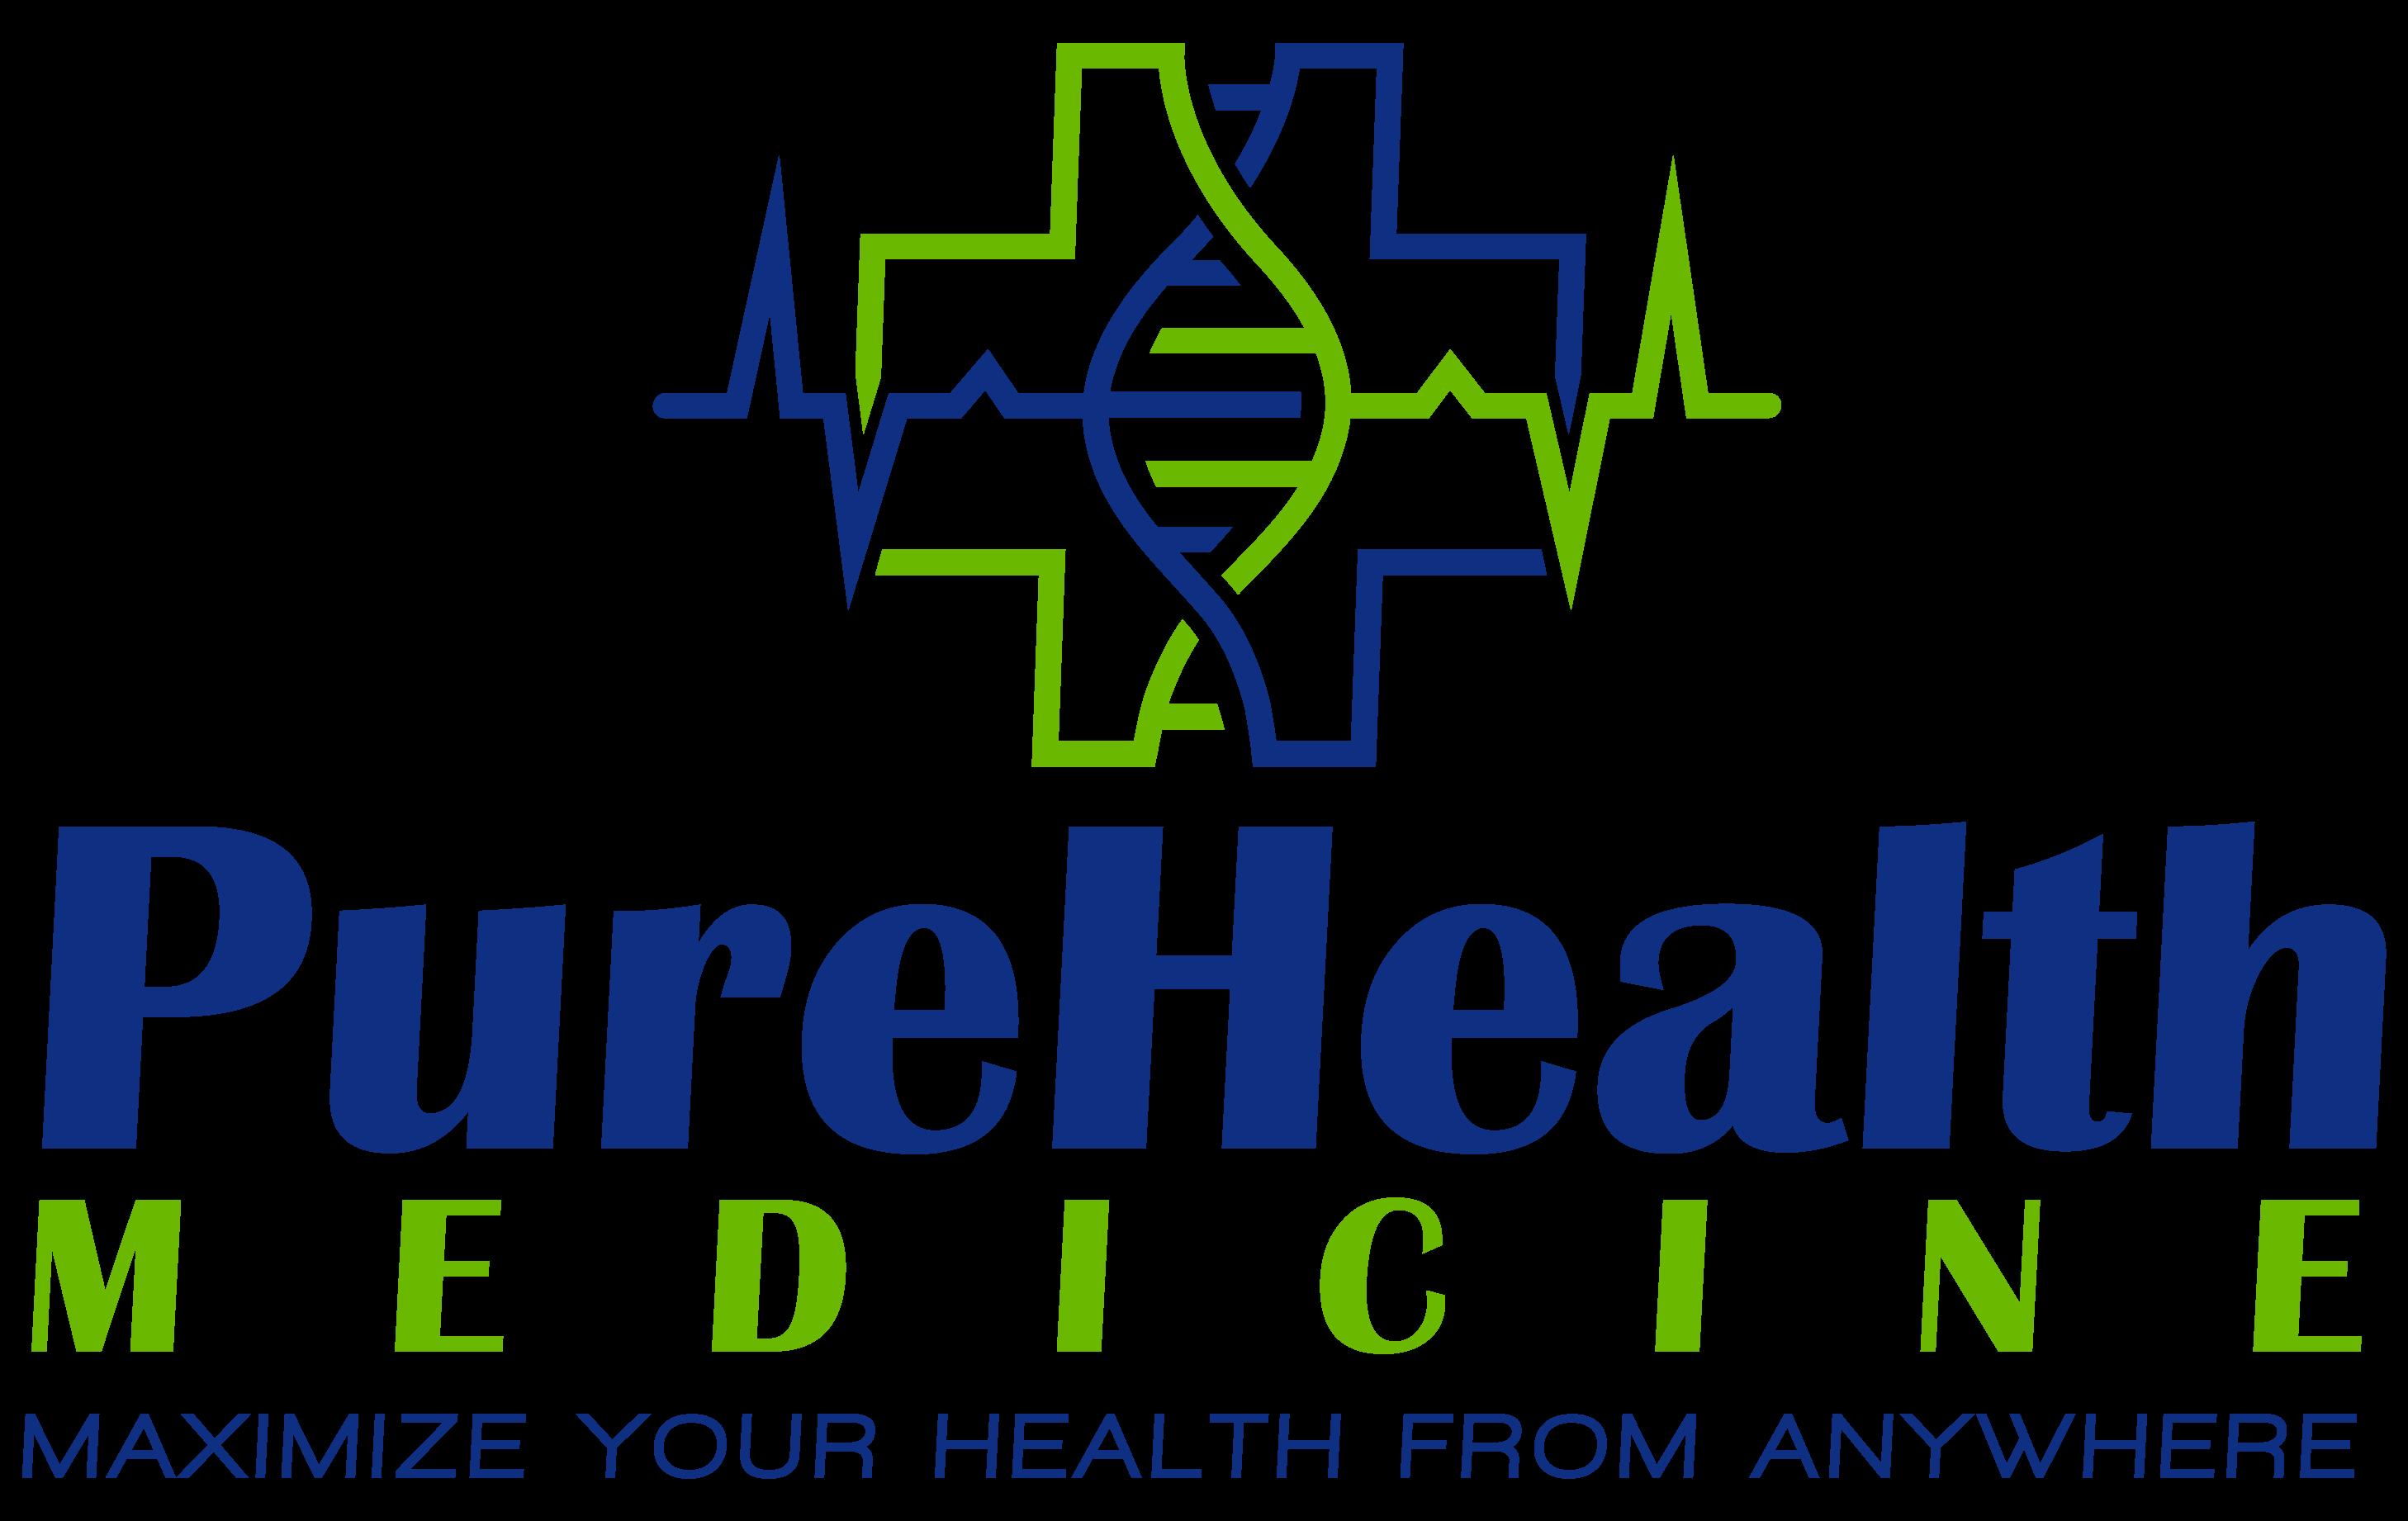 E- lab, telehealth services, BP checking, cholesterol monitoring